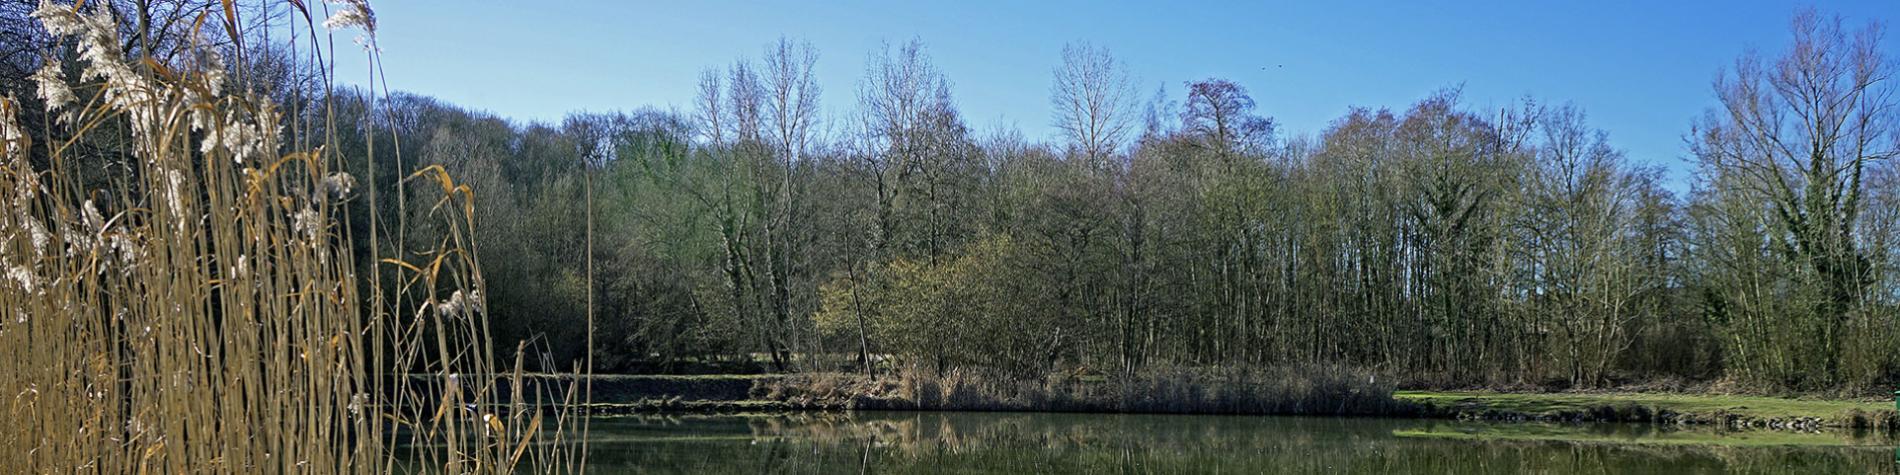 Bois - communal - Buston